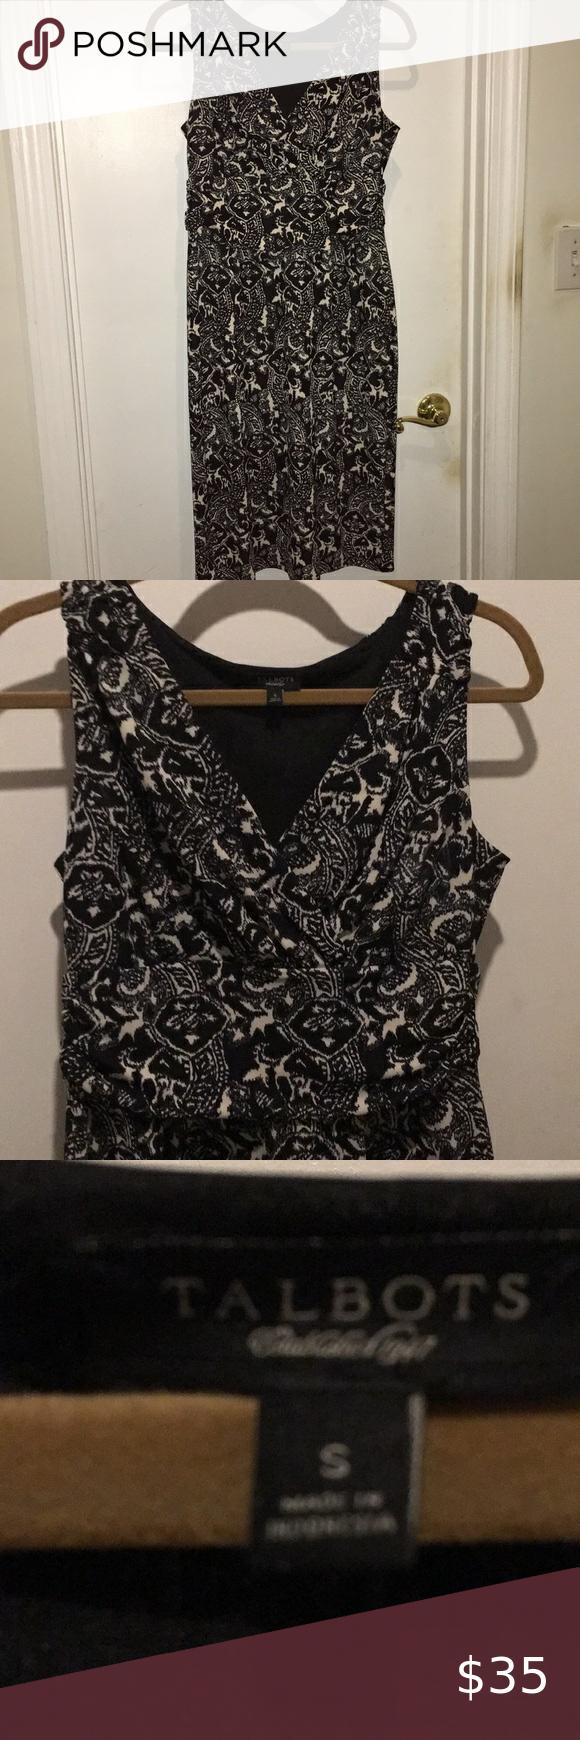 Euc Talbots Print Dress In 2020 Print Dress Clothes Design Fashion Design